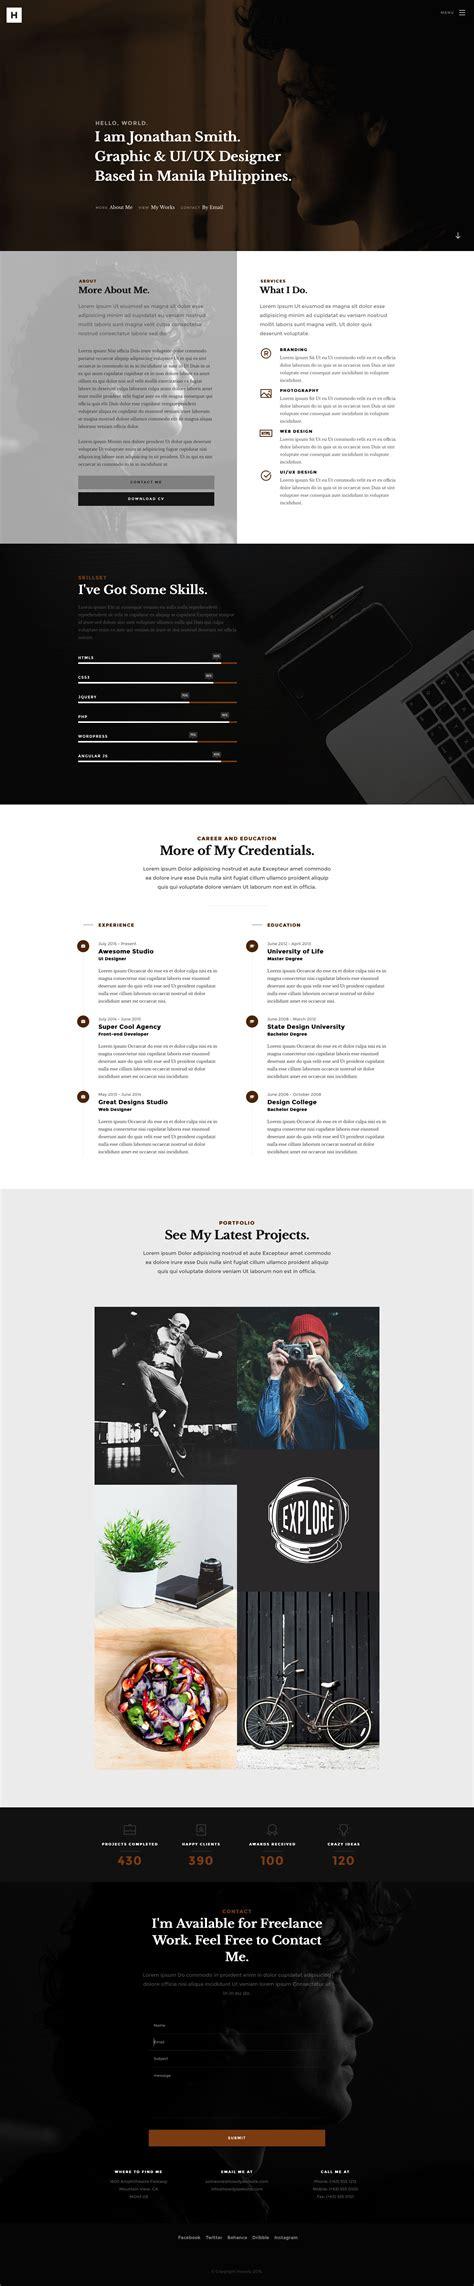 howdy free responsive html5 bootstrap portfolio template